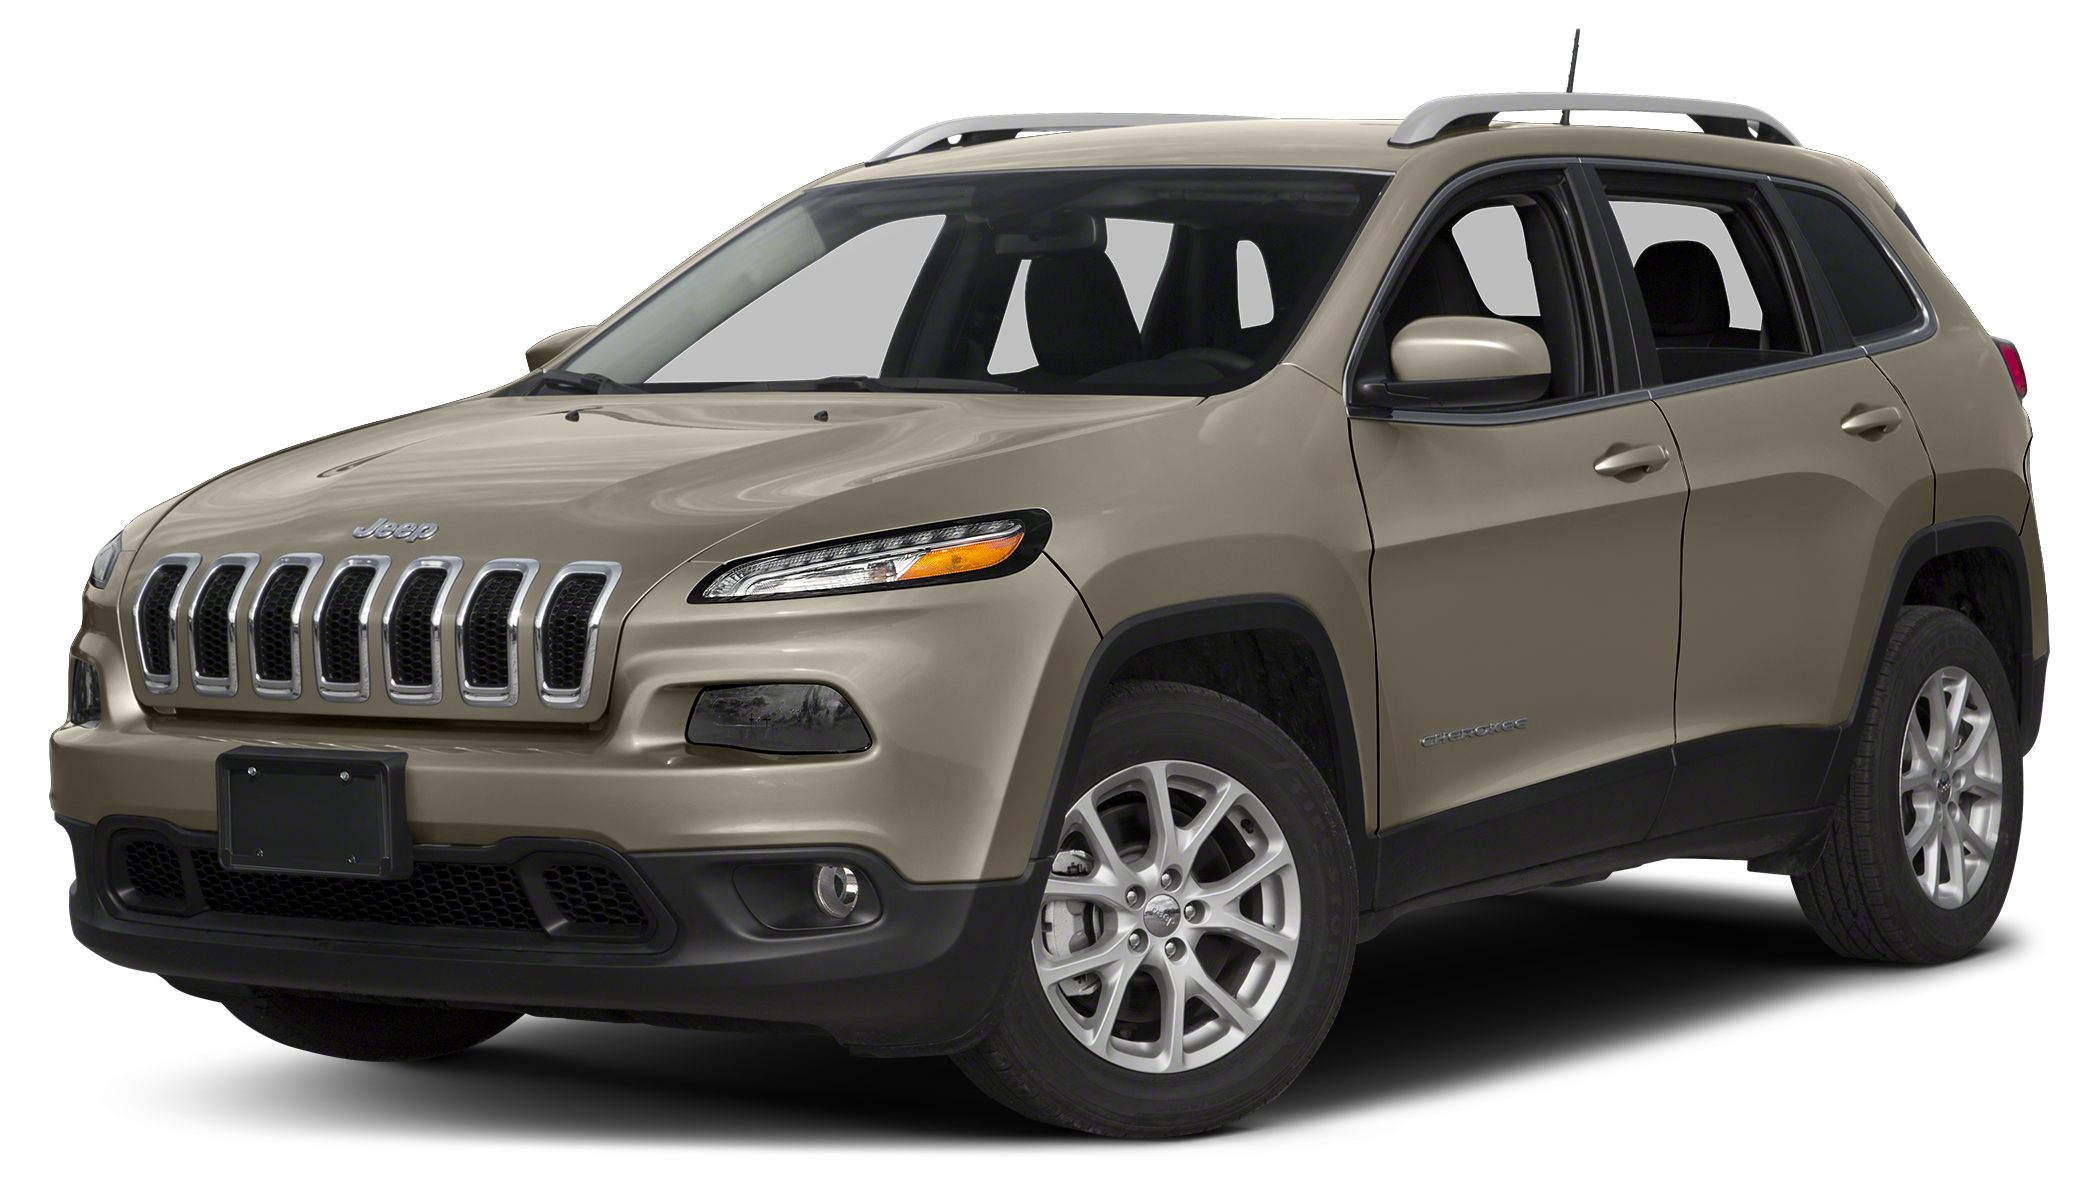 2017 Jeep Cherokee Latitude Color Light Brownstone Pearlcoat Stock 17X031 VIN 1C4PJLCBXHW5074